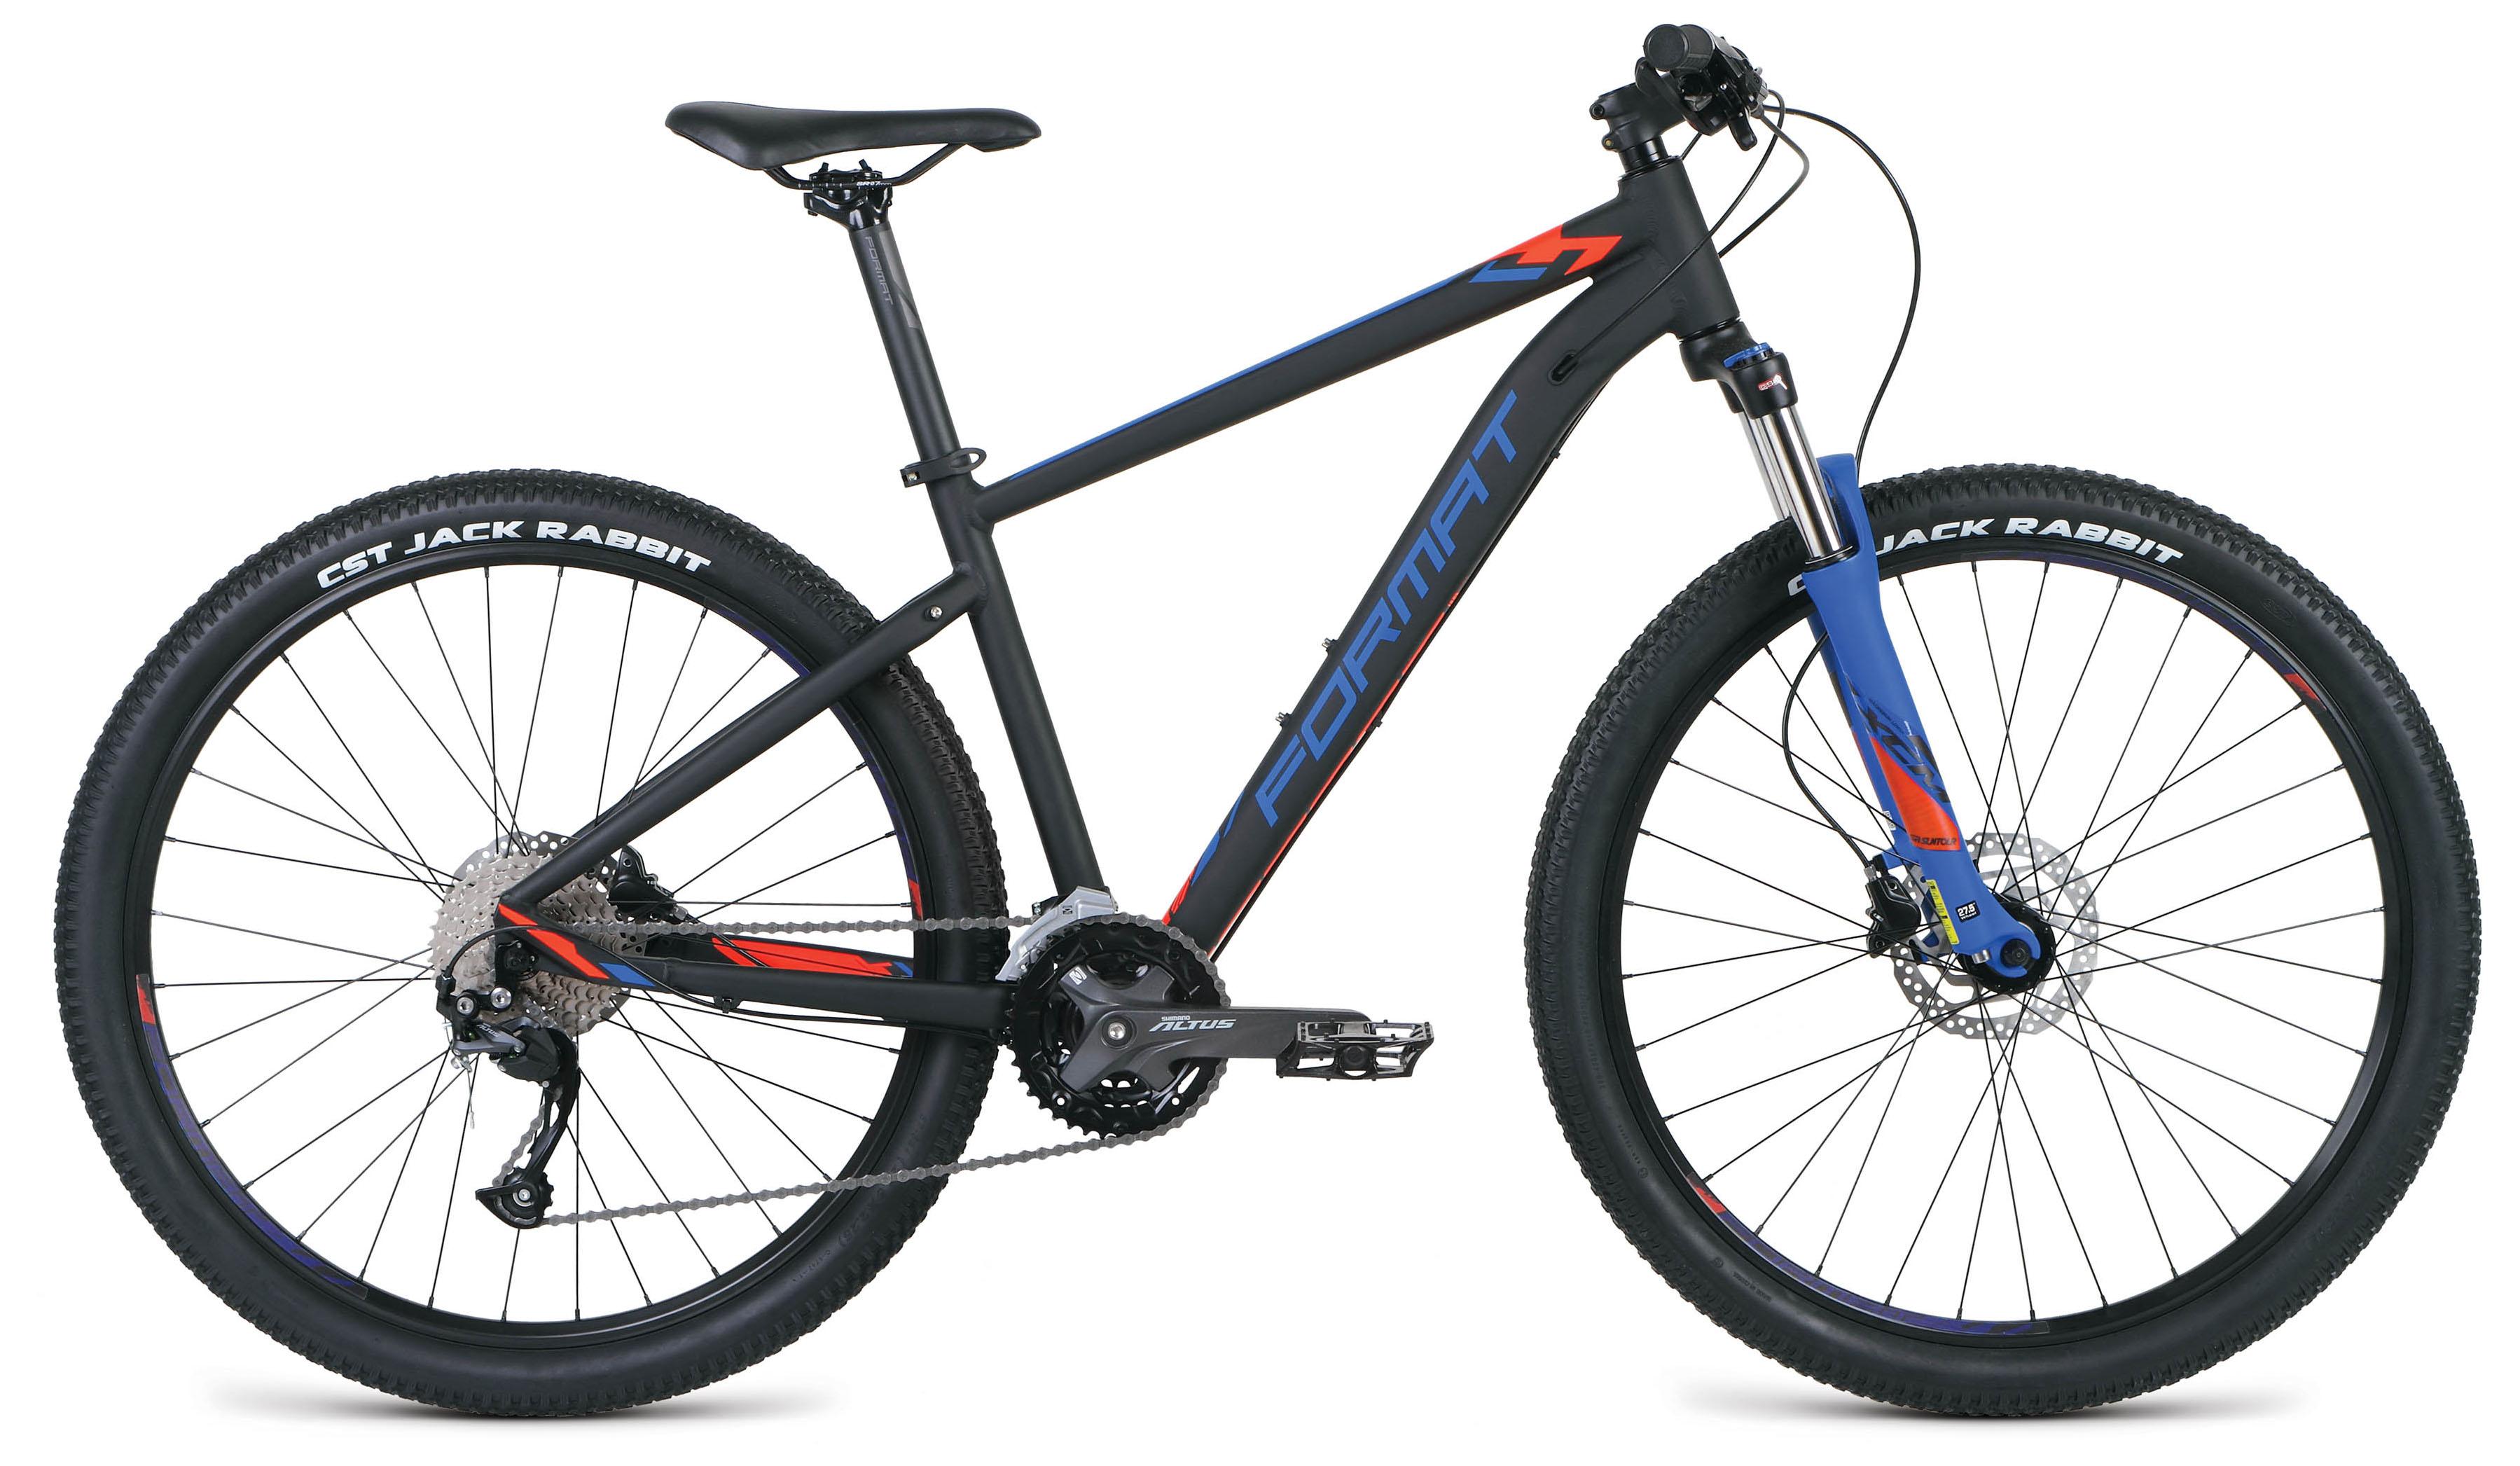 цена на Велосипед Format 1412 27,5 2019